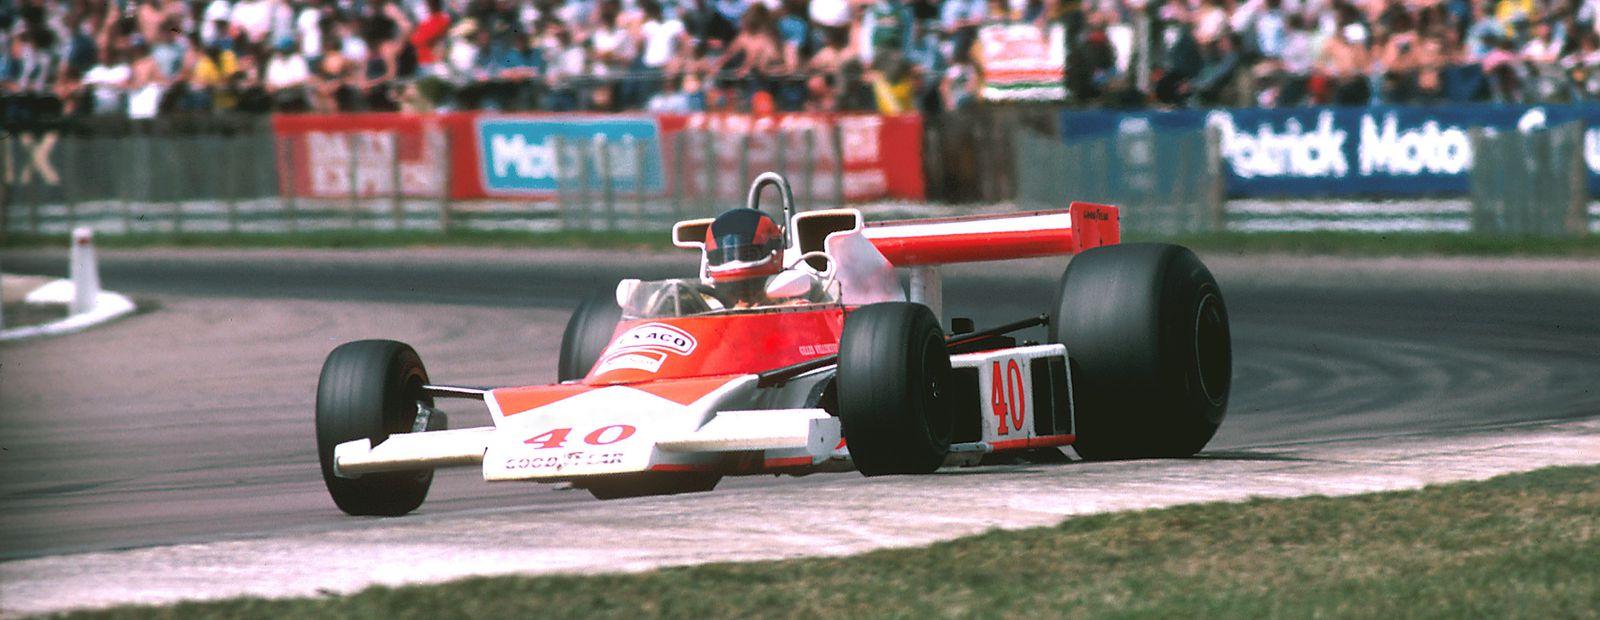 Gilles Villeneuve and McLaren